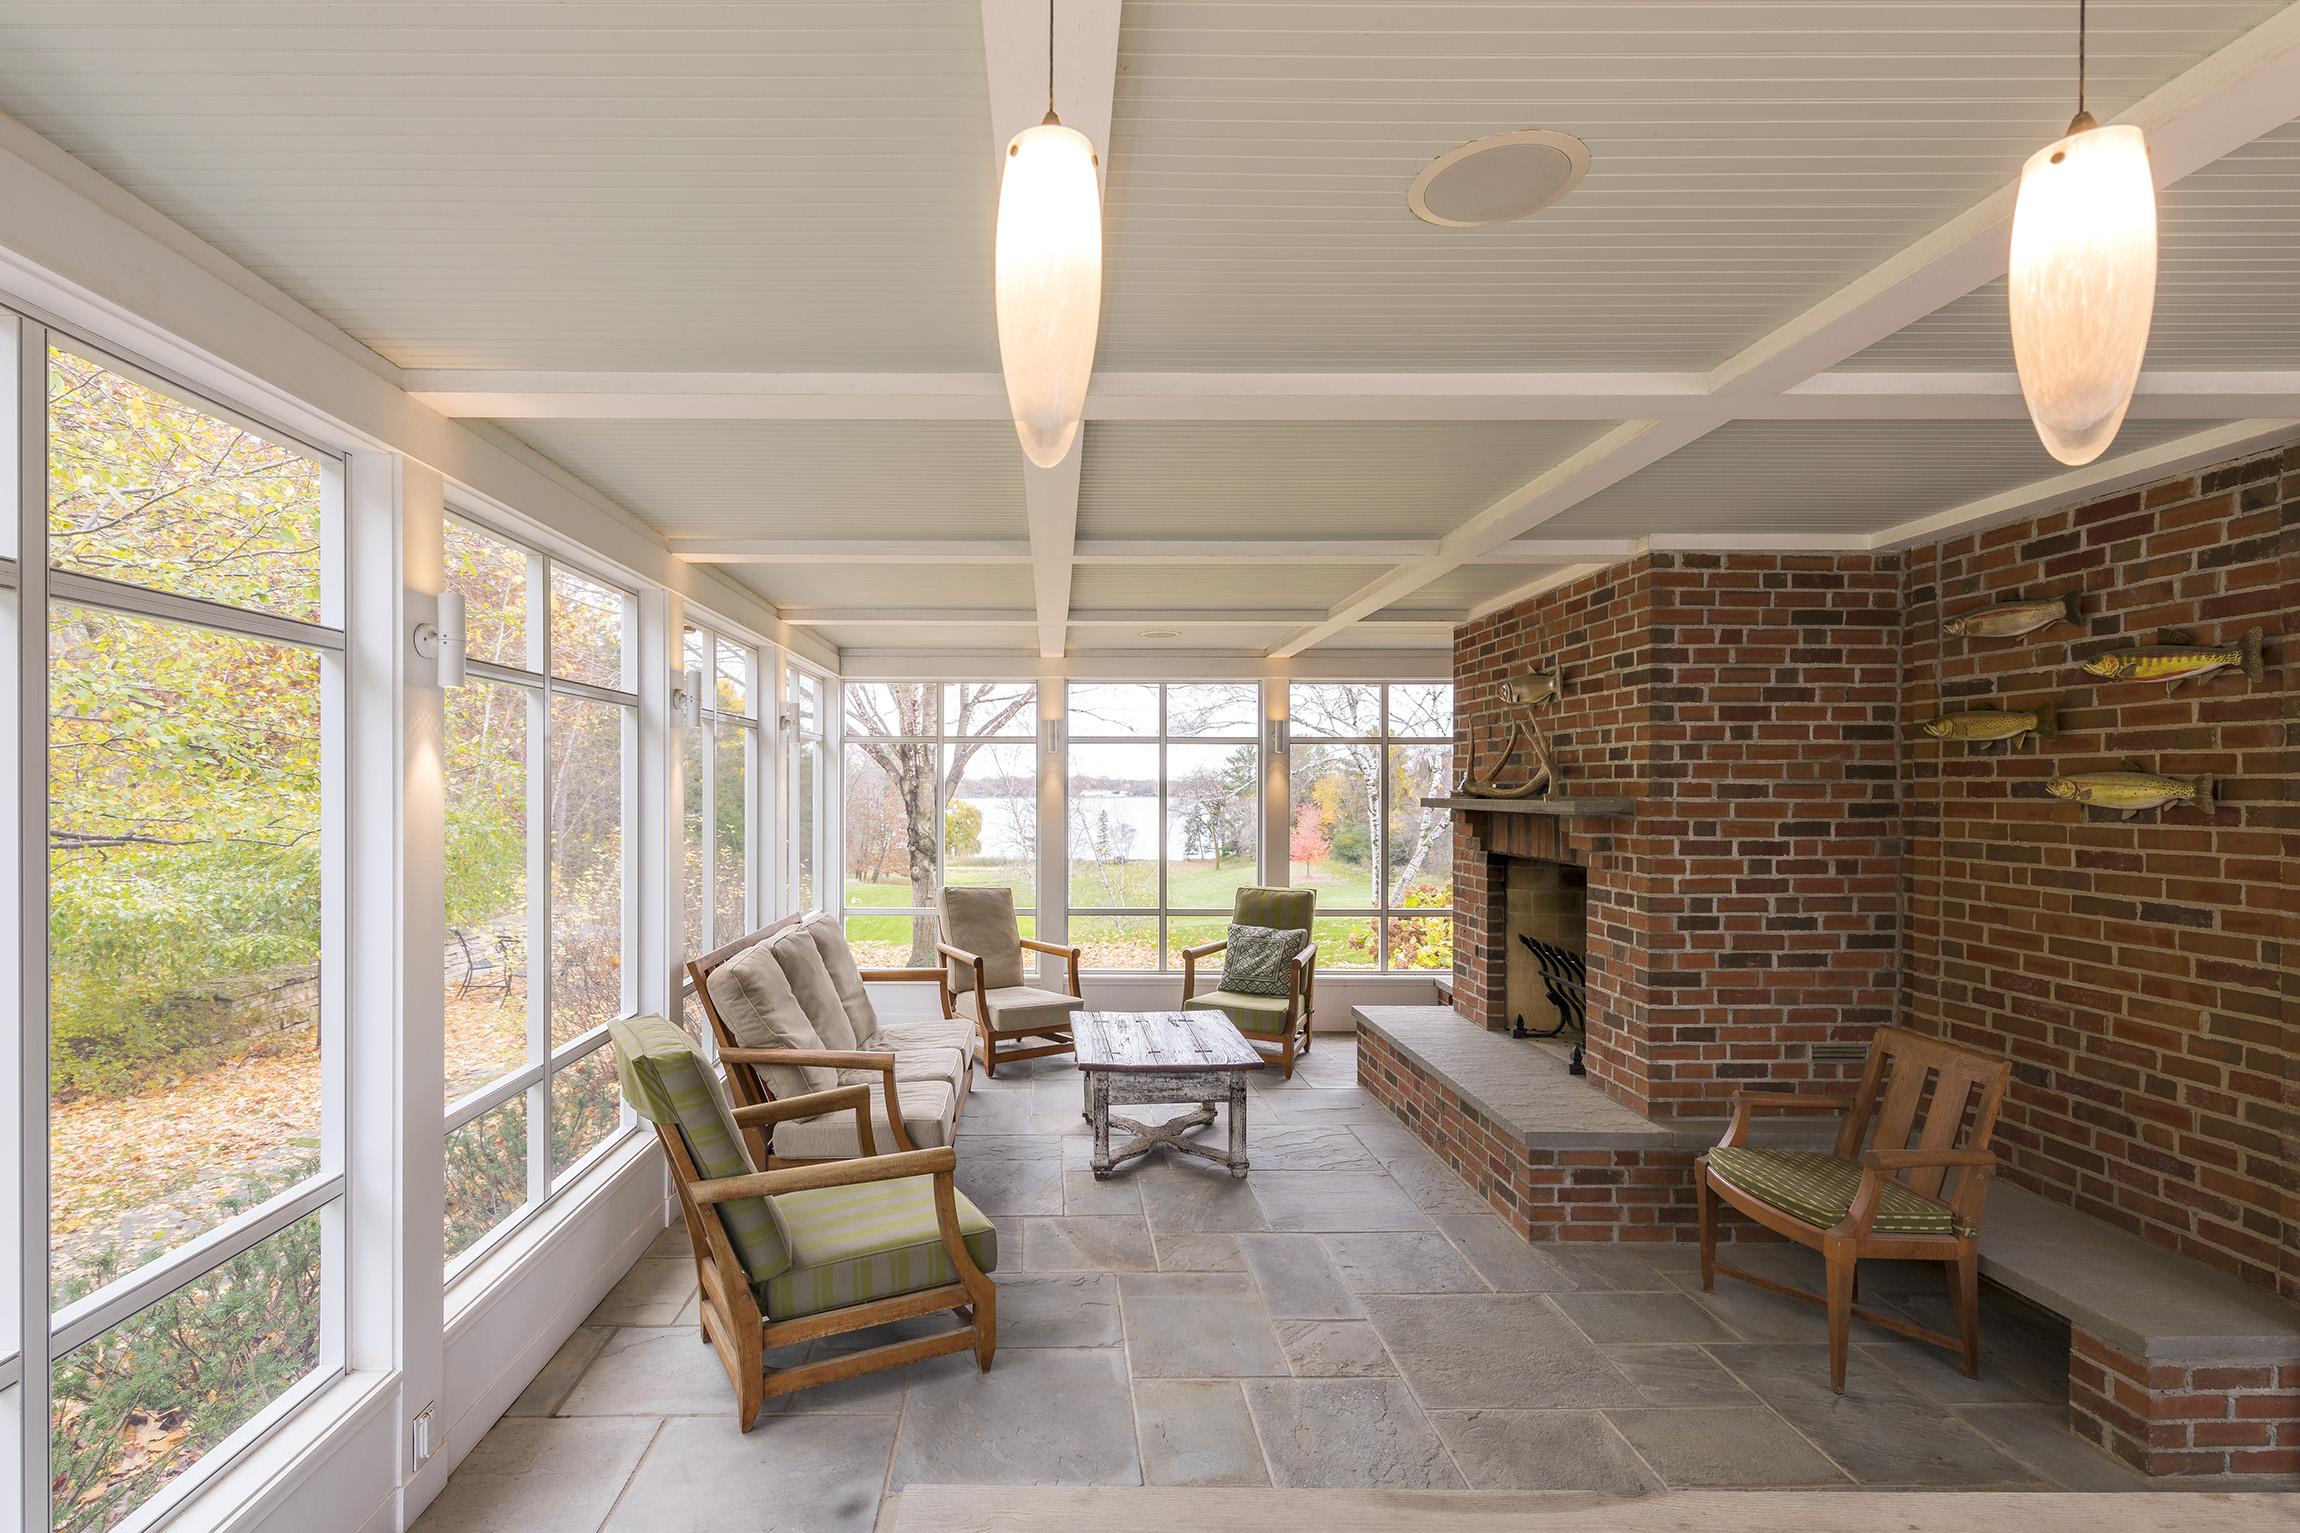 LLake-Porch-Interior-Large.jpg